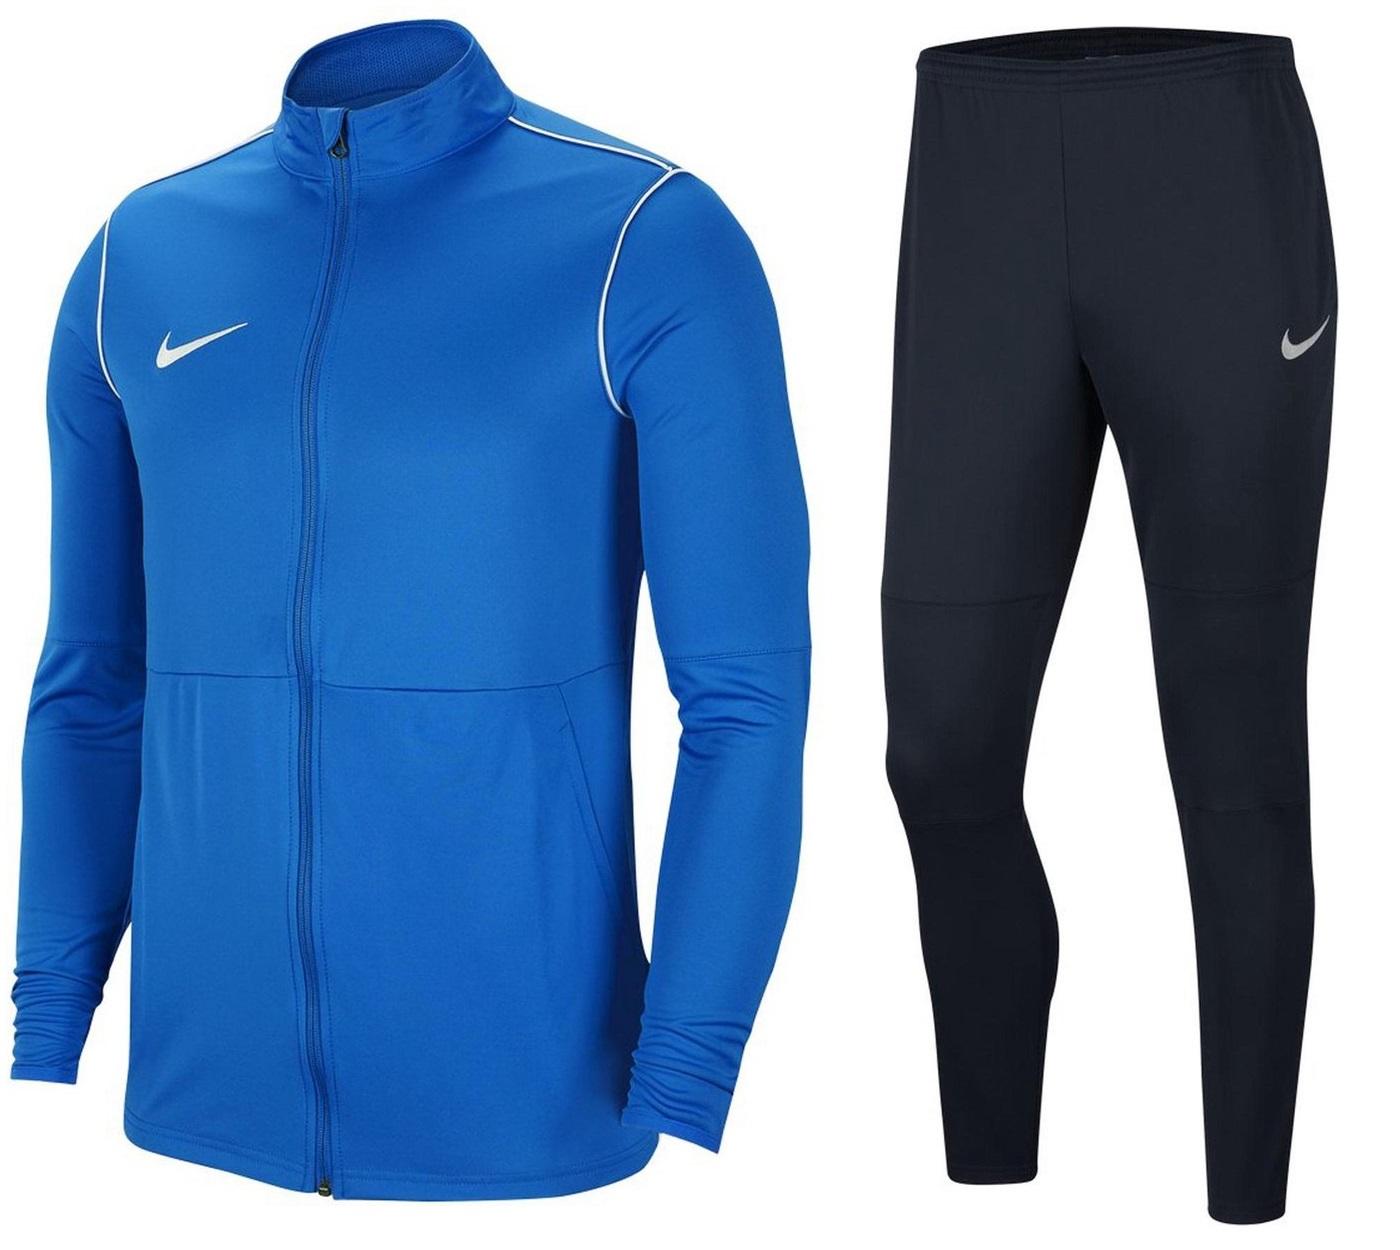 Nike Heren Sport set Basic Dry-Fit Tracksuit Blauw